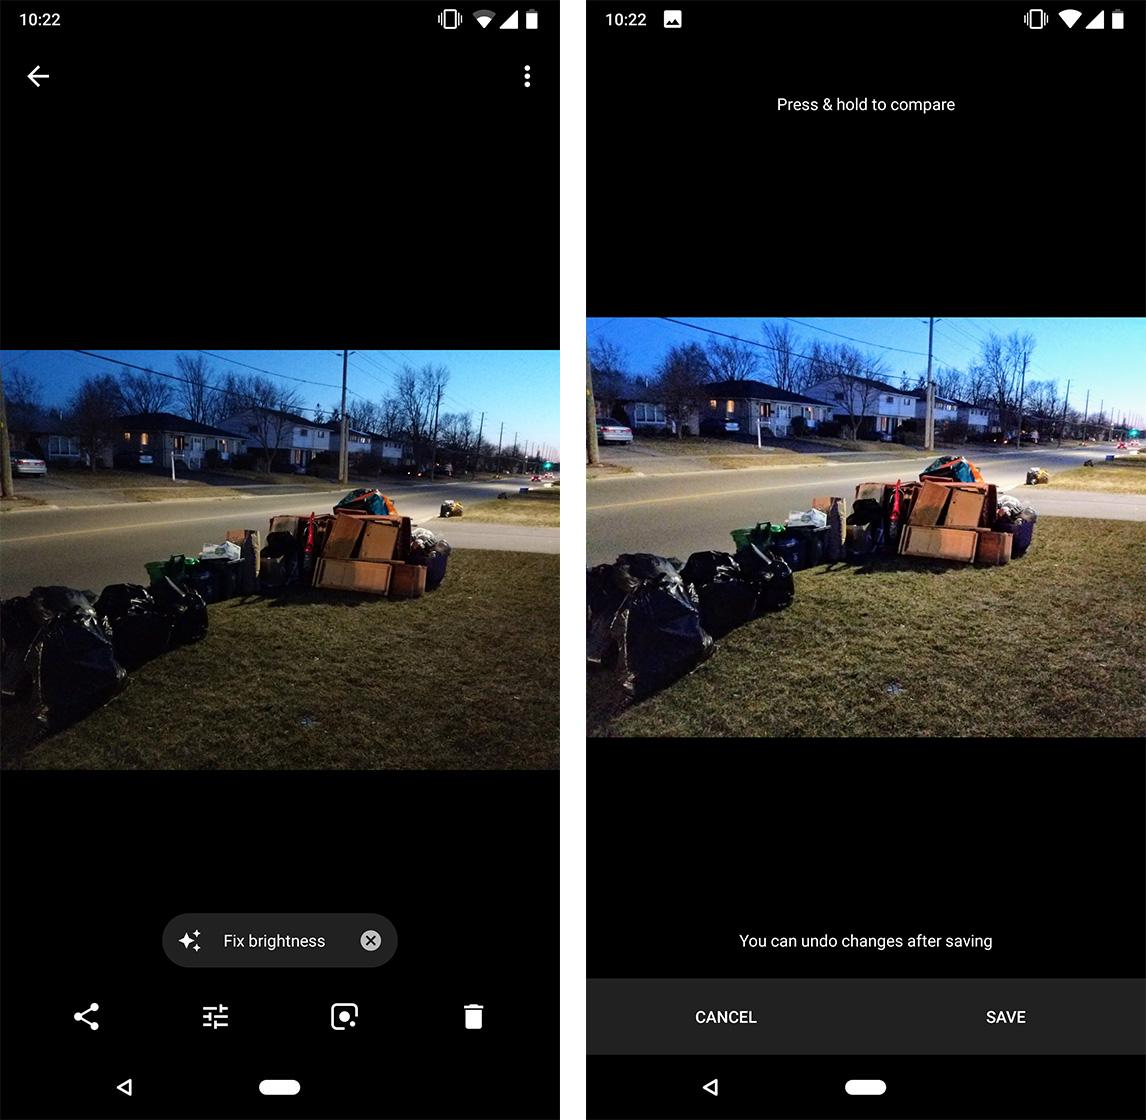 Google Photos fix brightness prompt